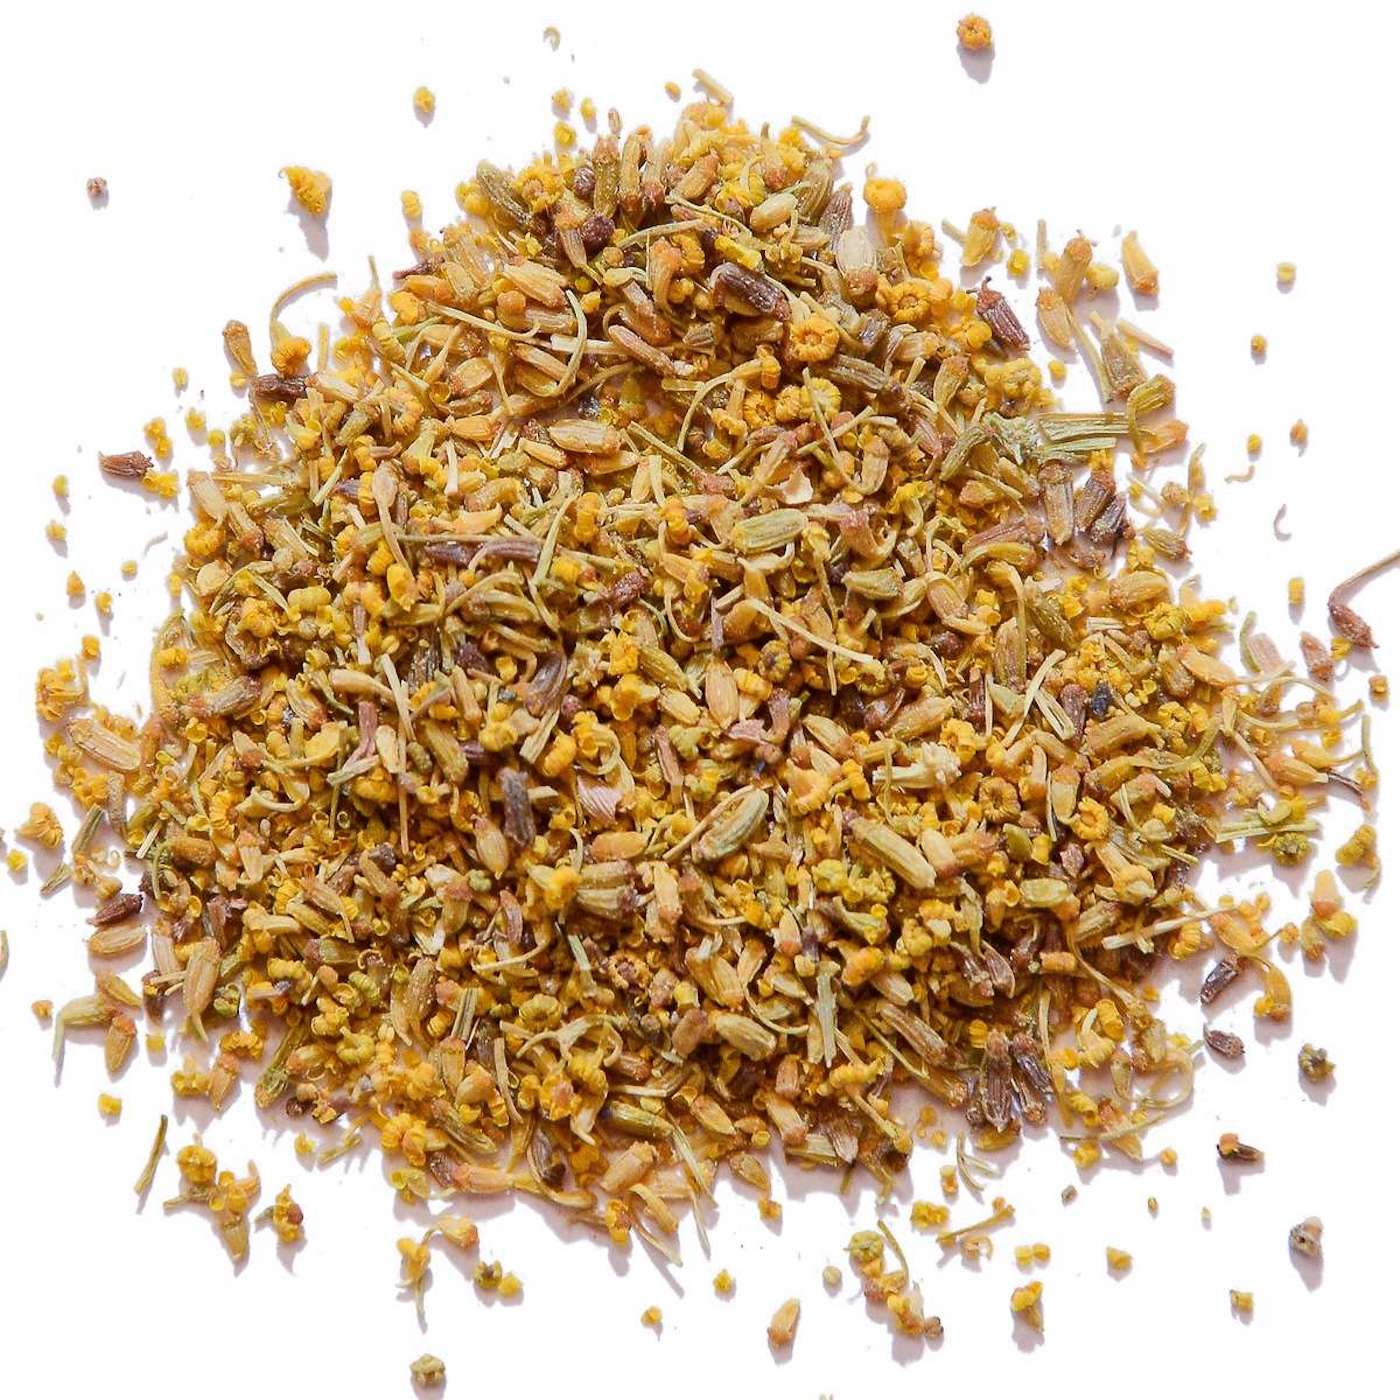 Fennel Pollen: An Intense Tuscan Spice